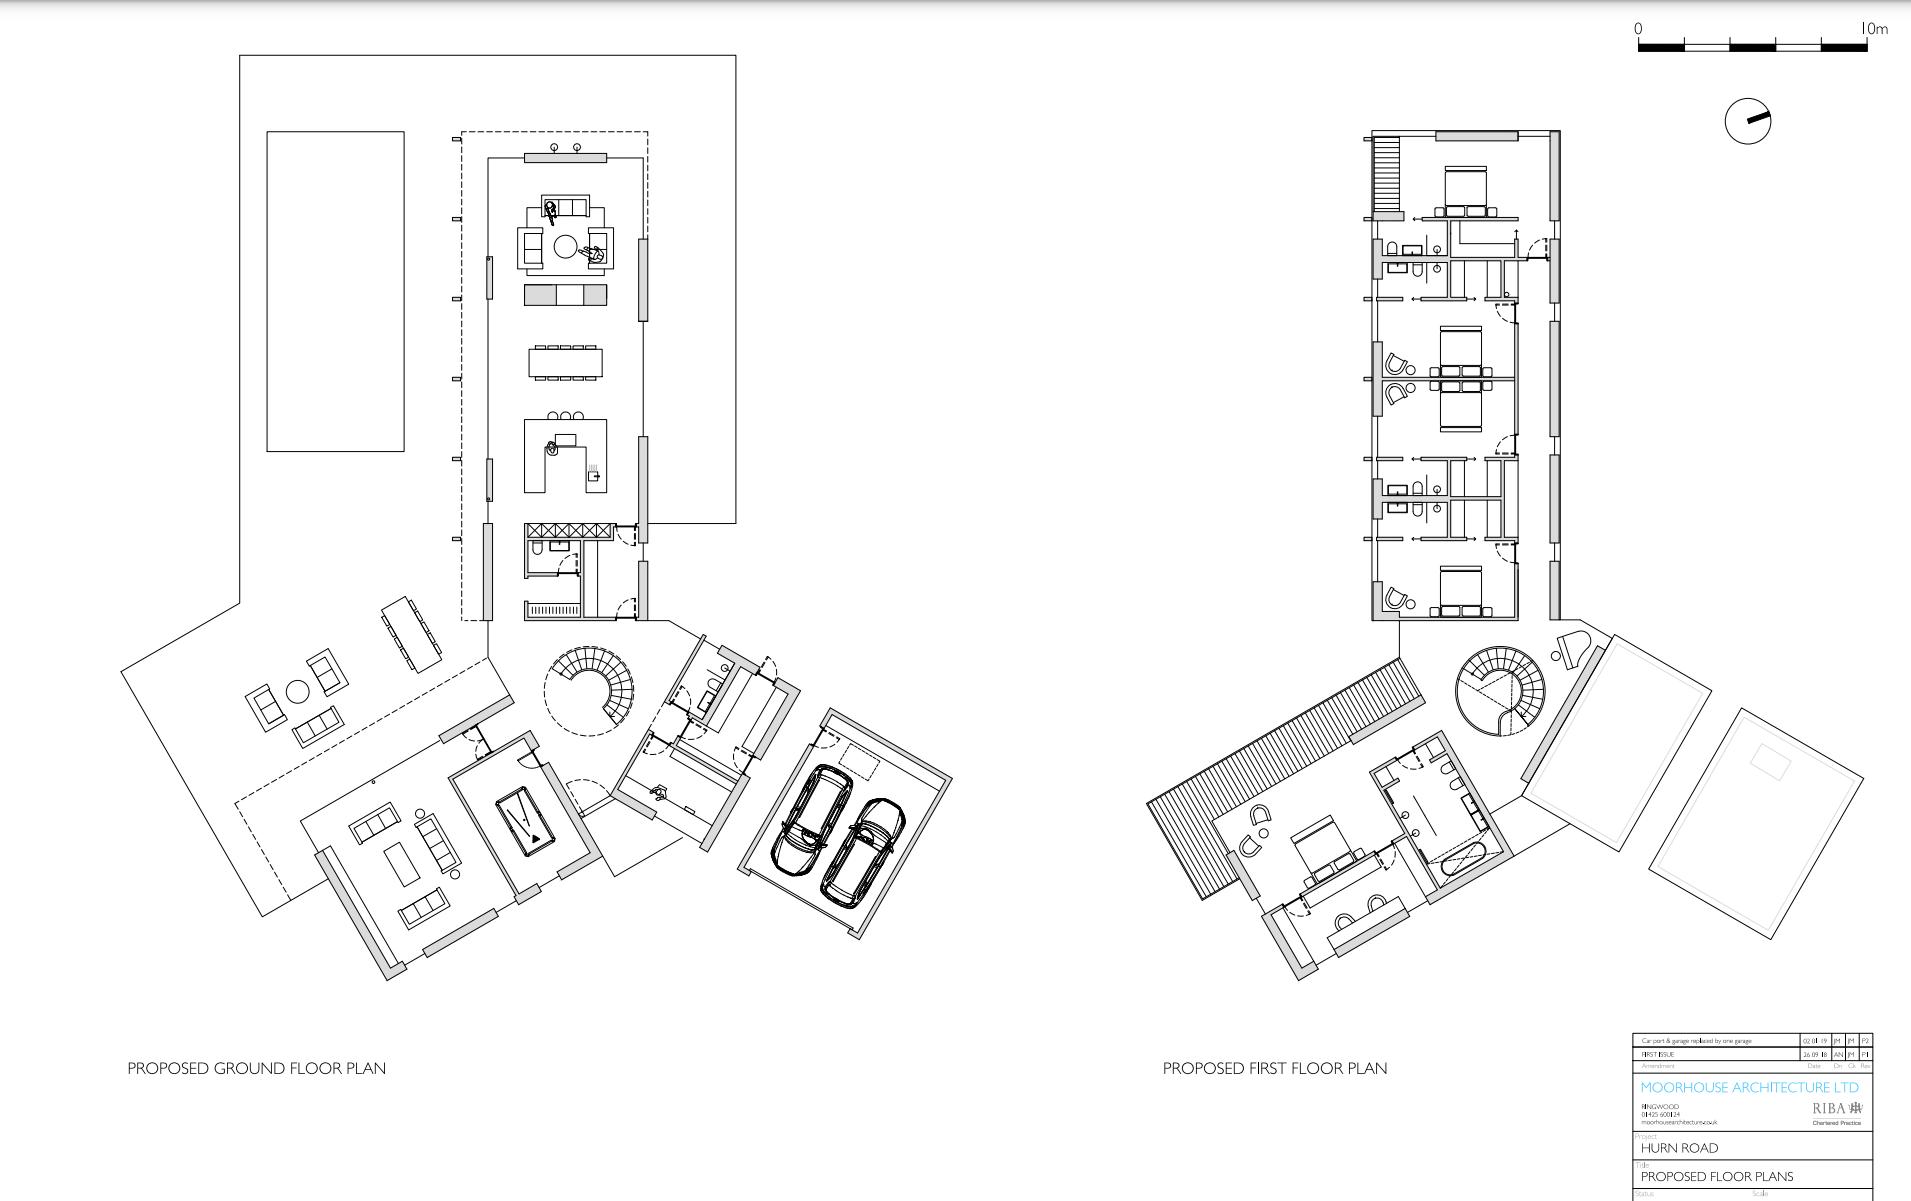 Floorplan - Matchams, Ringwood, BH24 2BZ